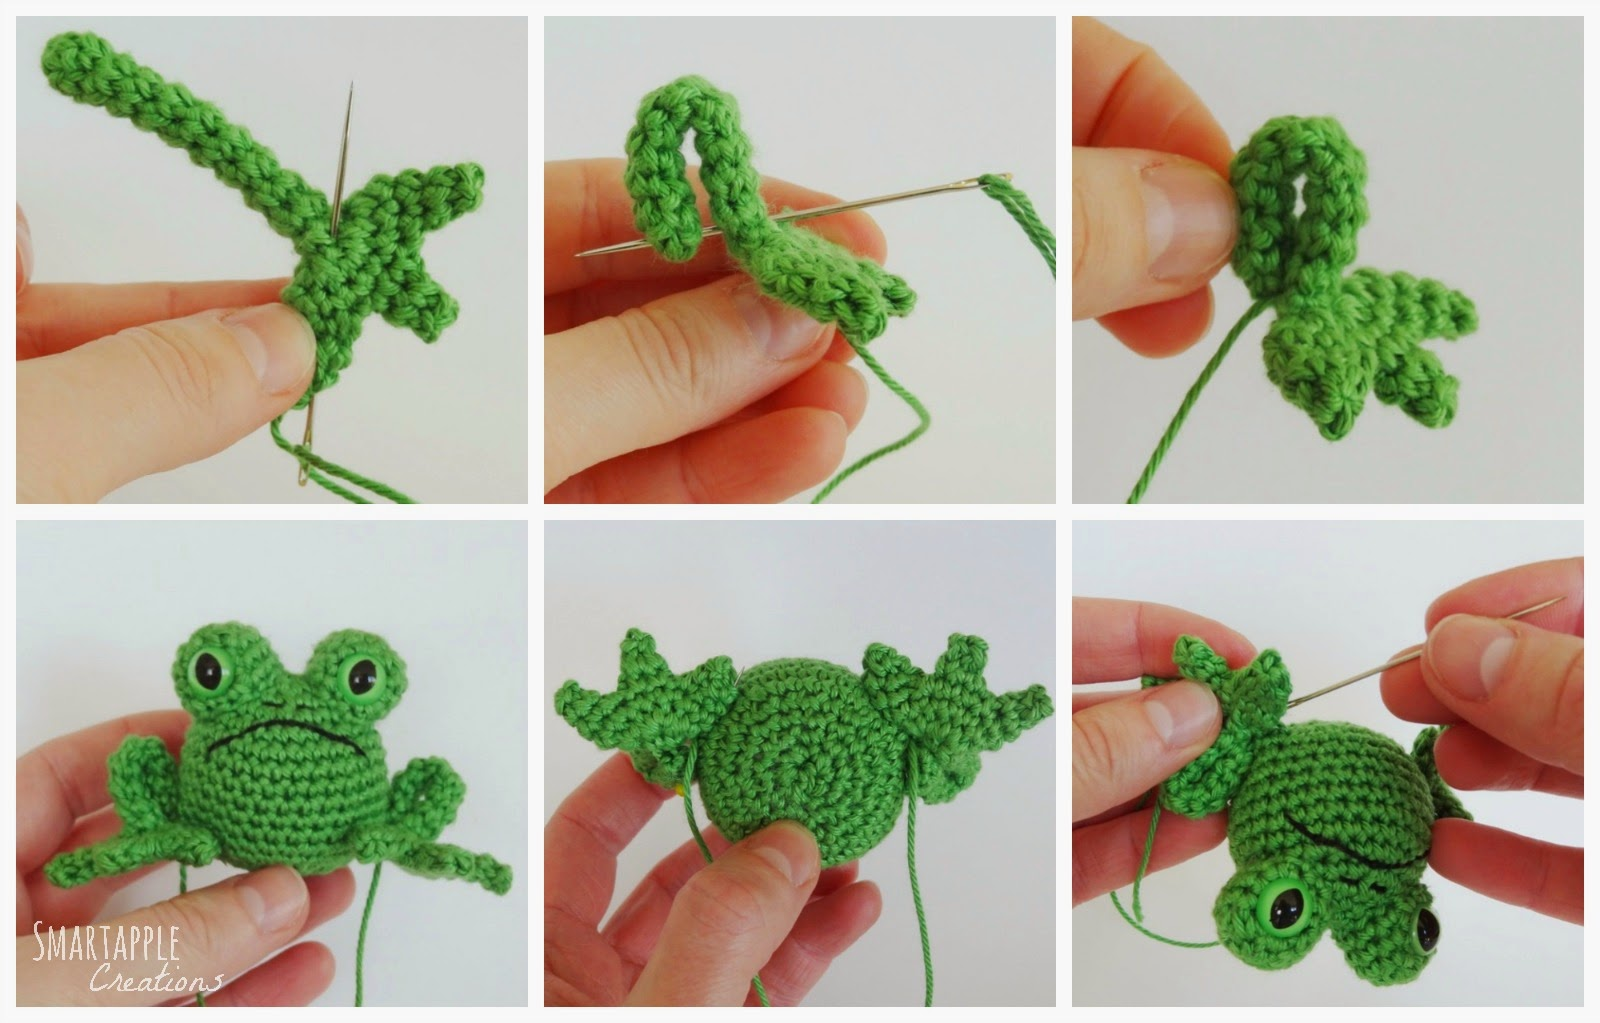 Amigurumi Frog Free Pattern : Smartapple Creations - amigurumi and crochet: Free pattern ...